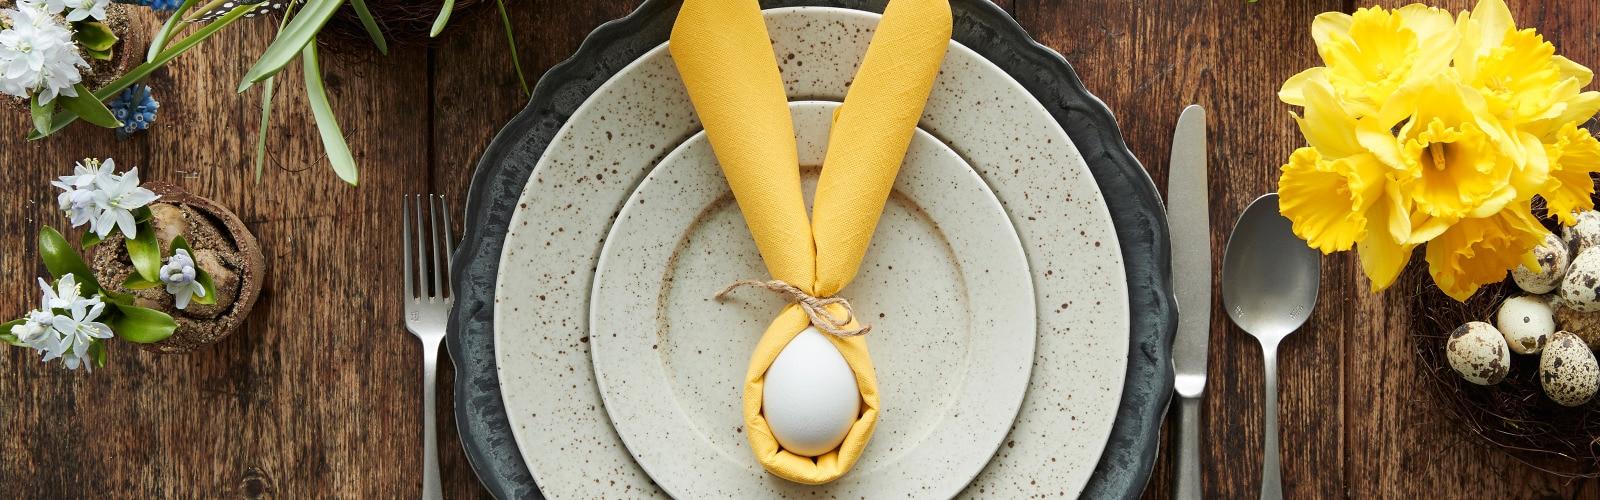 Easter table original.jpg